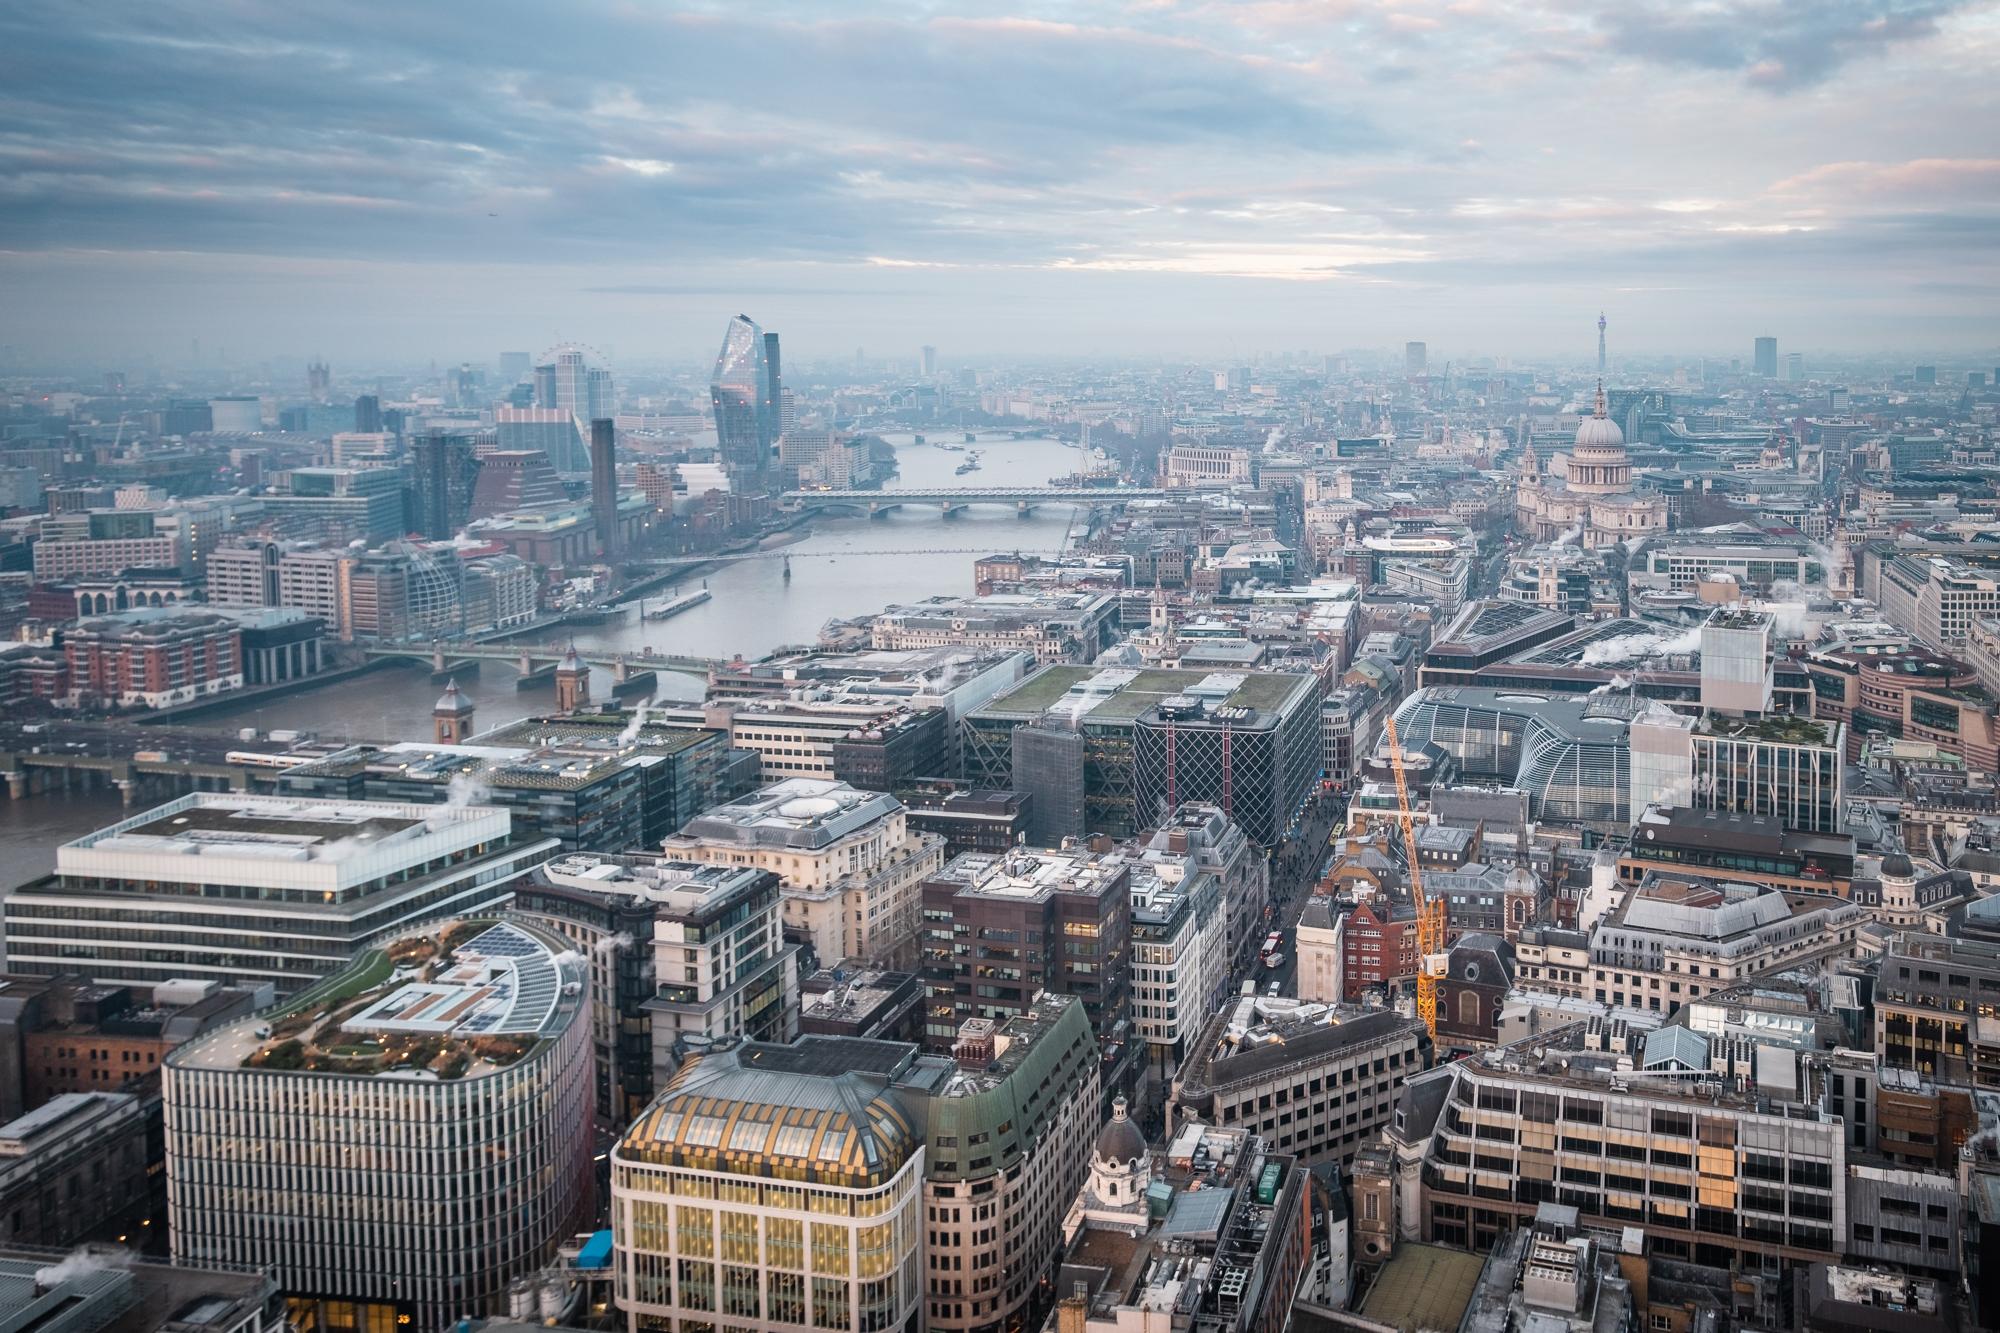 The view across West London taken from the Sky Garden by Trevor Sherwin